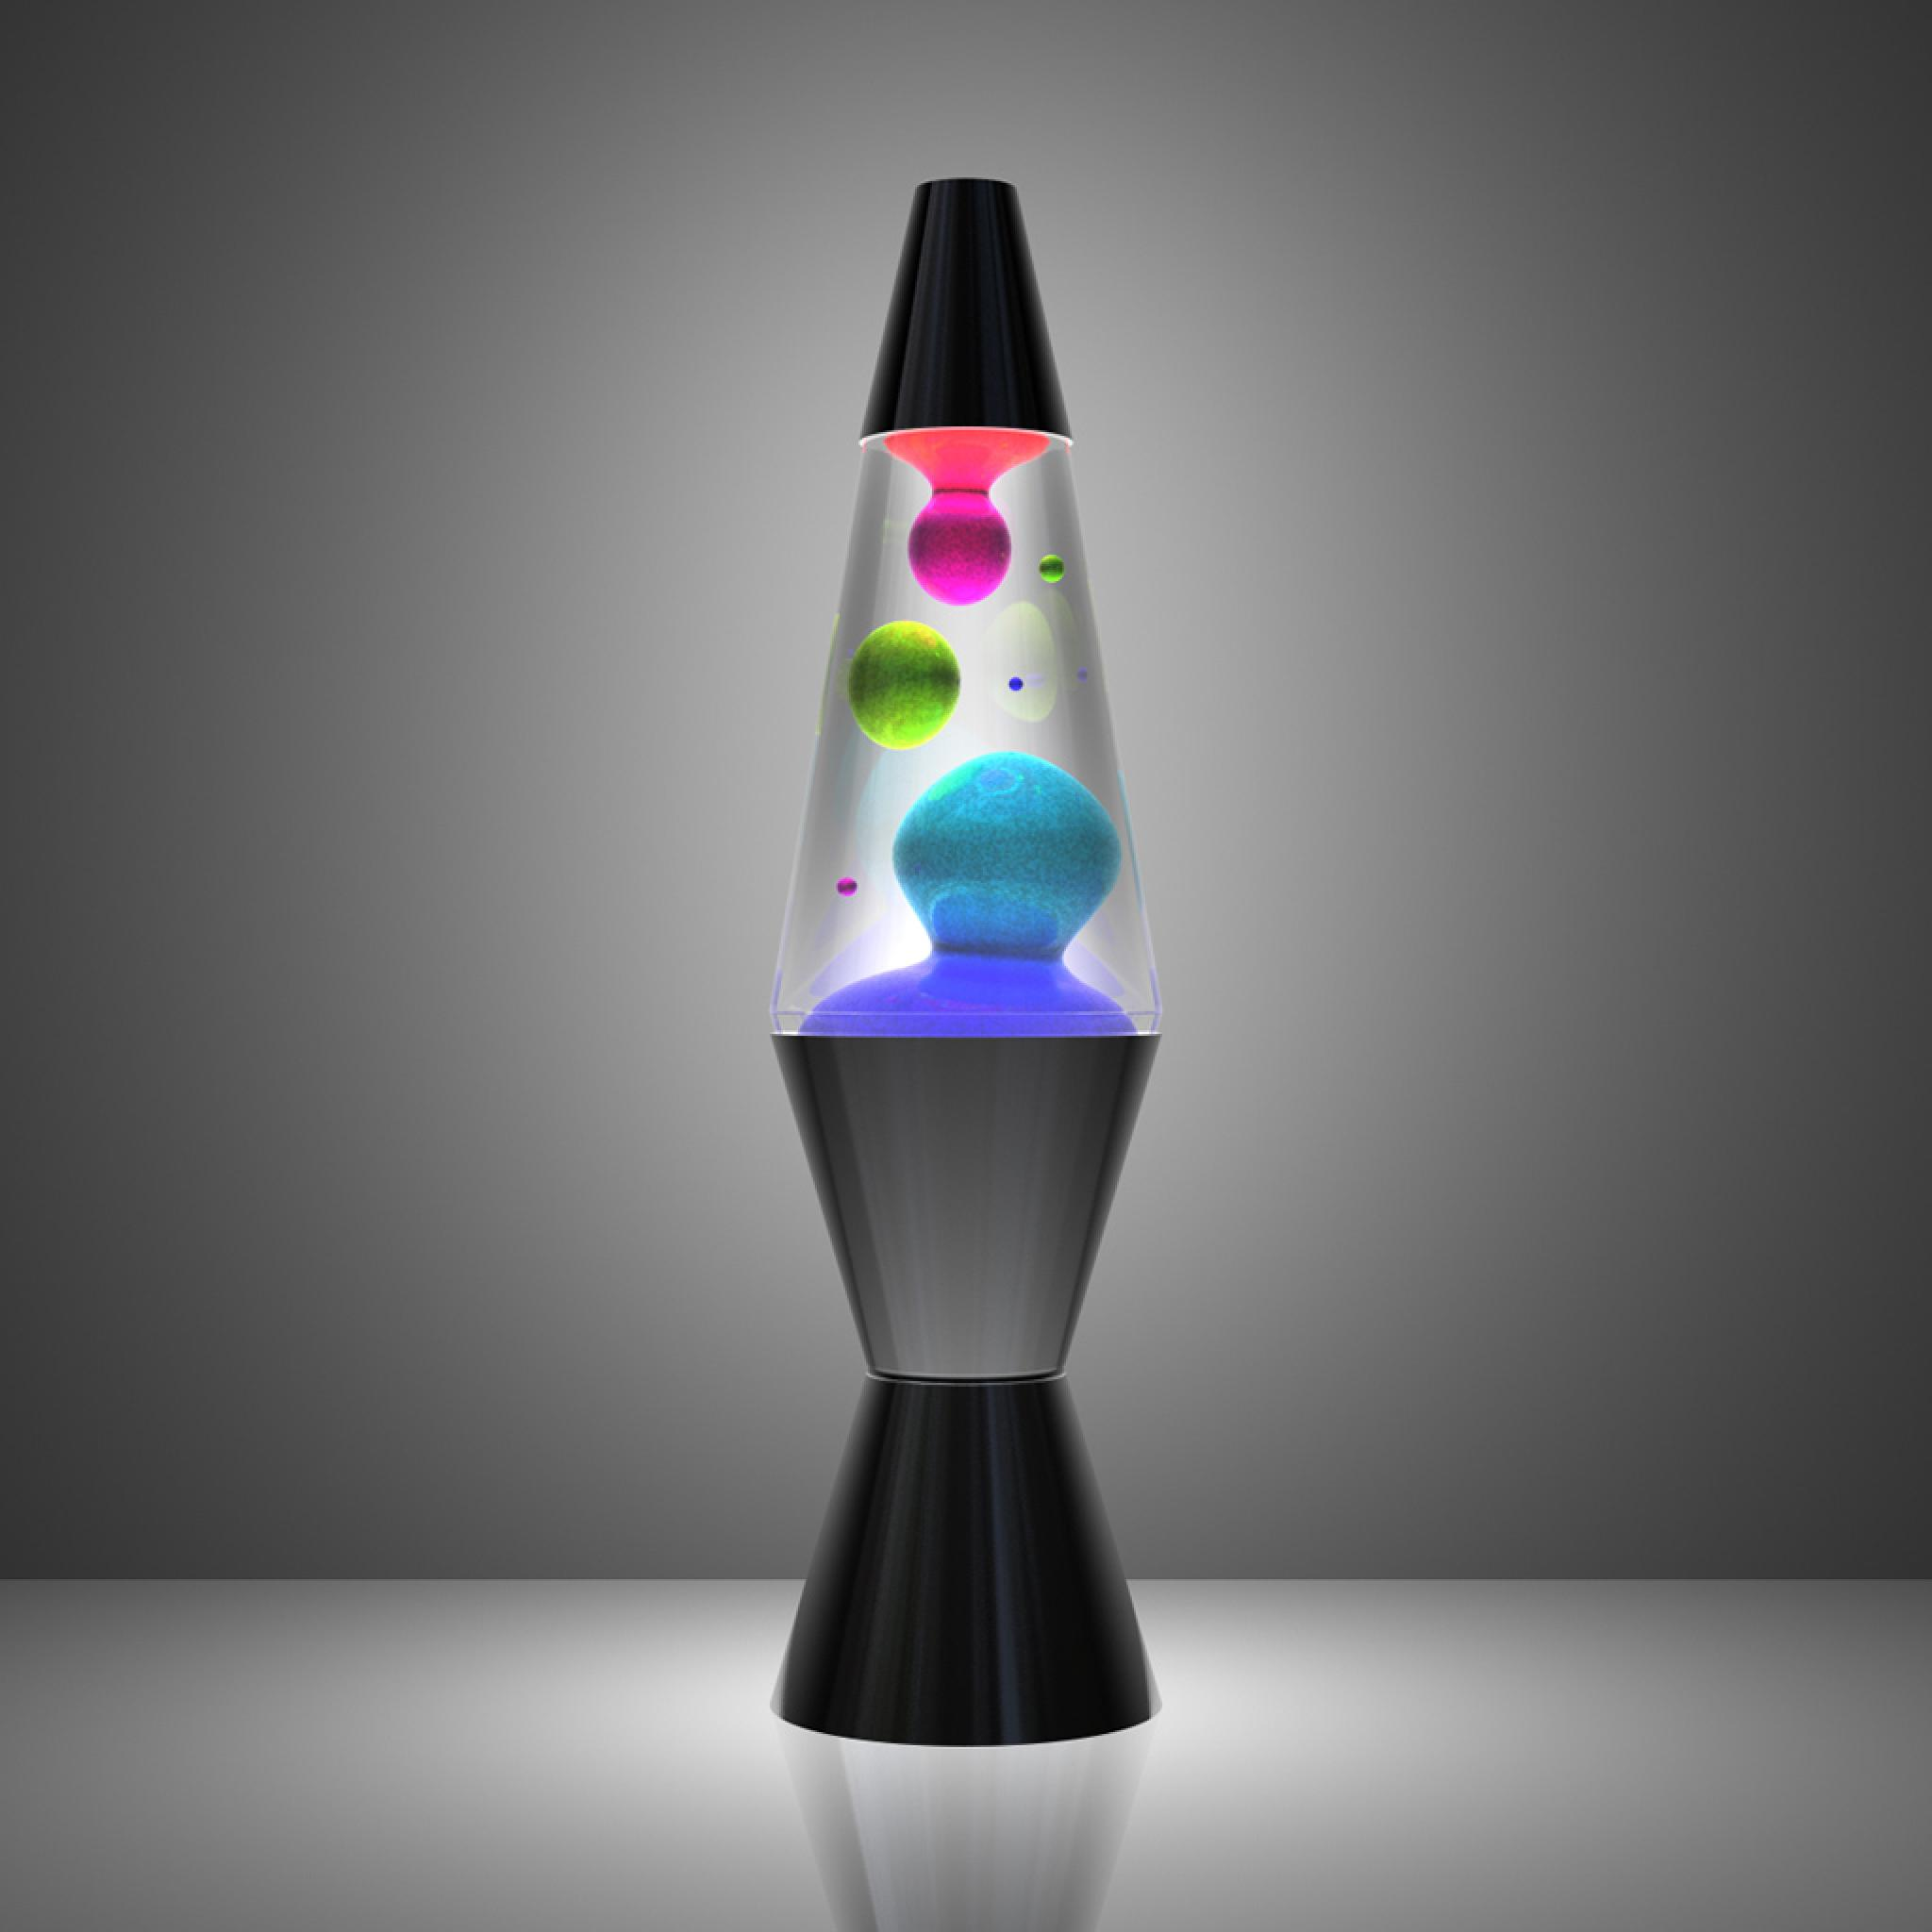 Lava lamp sizes